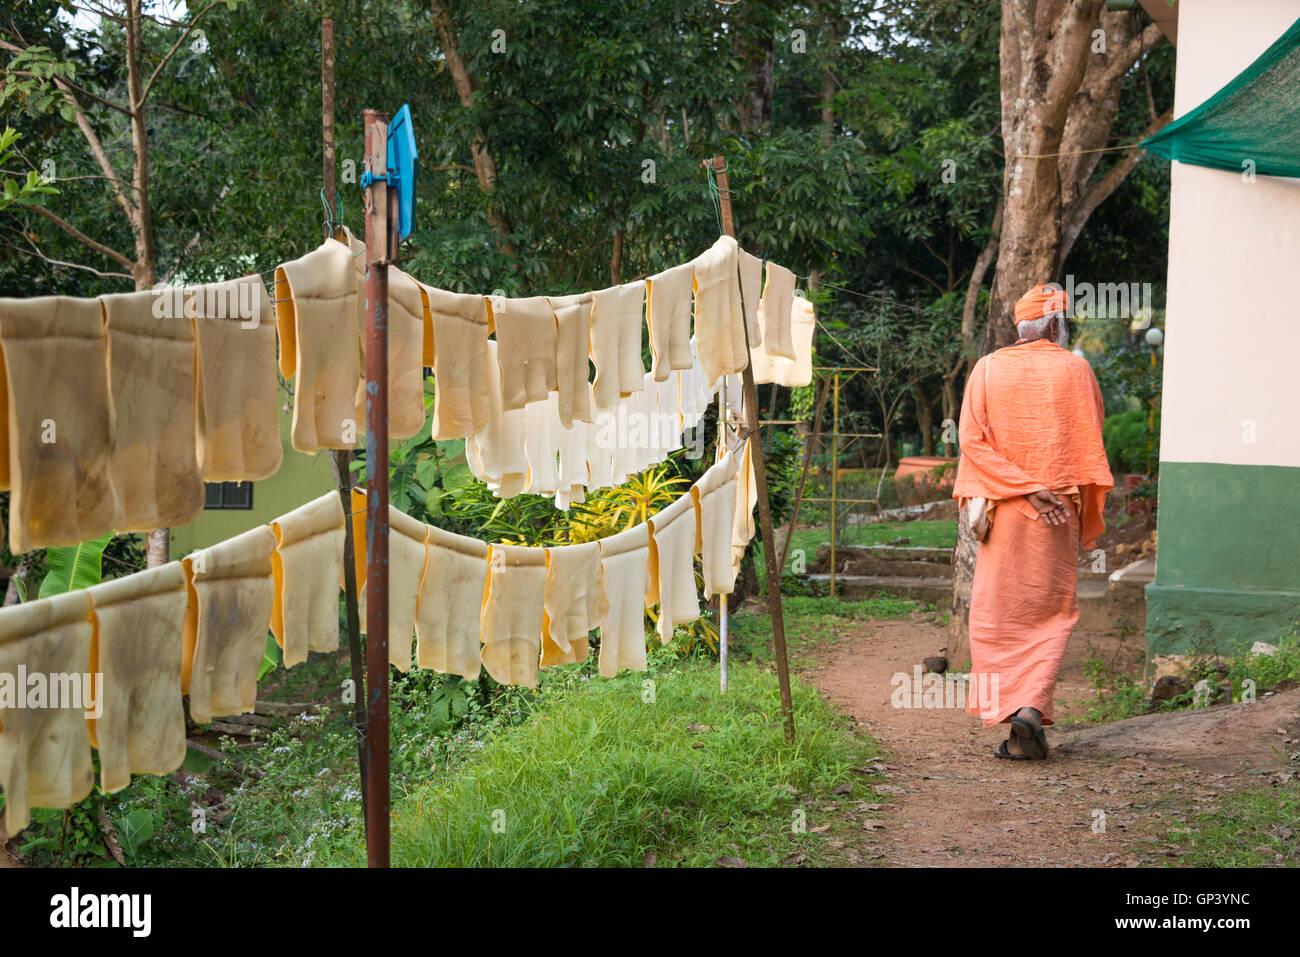 Rubber tapping at Sivananda Yoga Vedanta Dhanwantari Ashram, Neyyardam, India - Stock Image